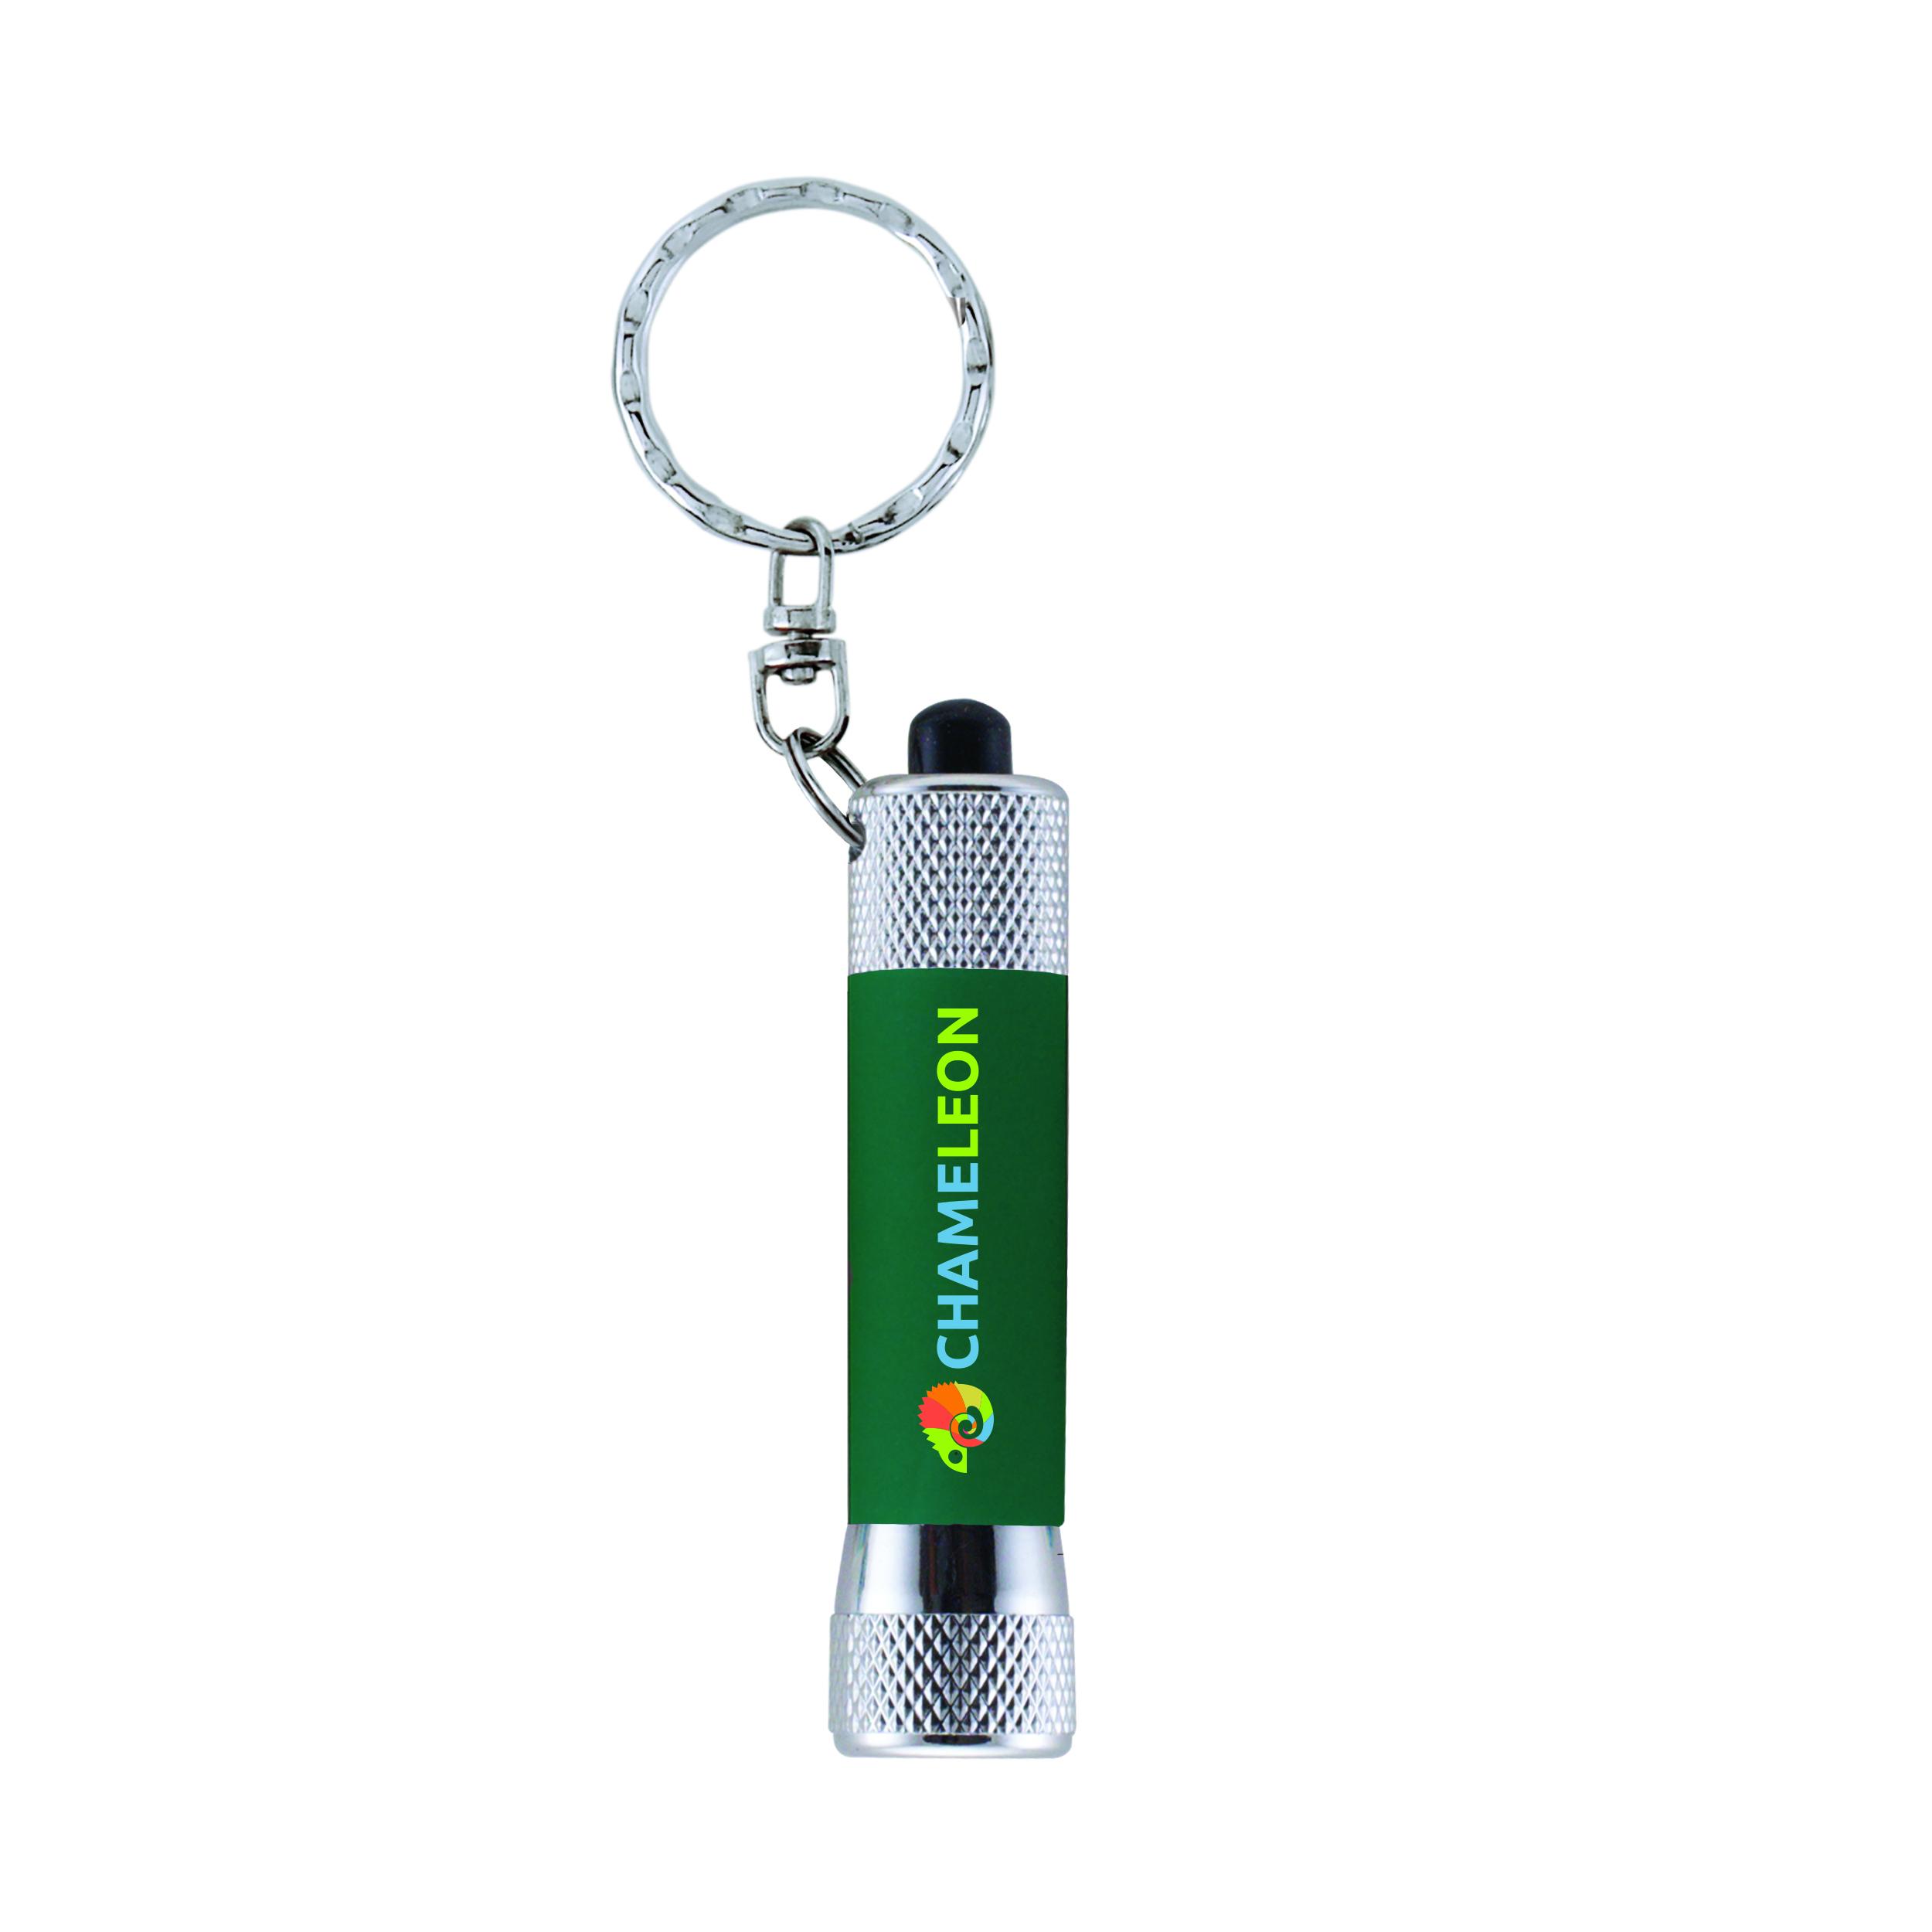 Porte-clés lampe Mc Queen Softy - 16-1010-60